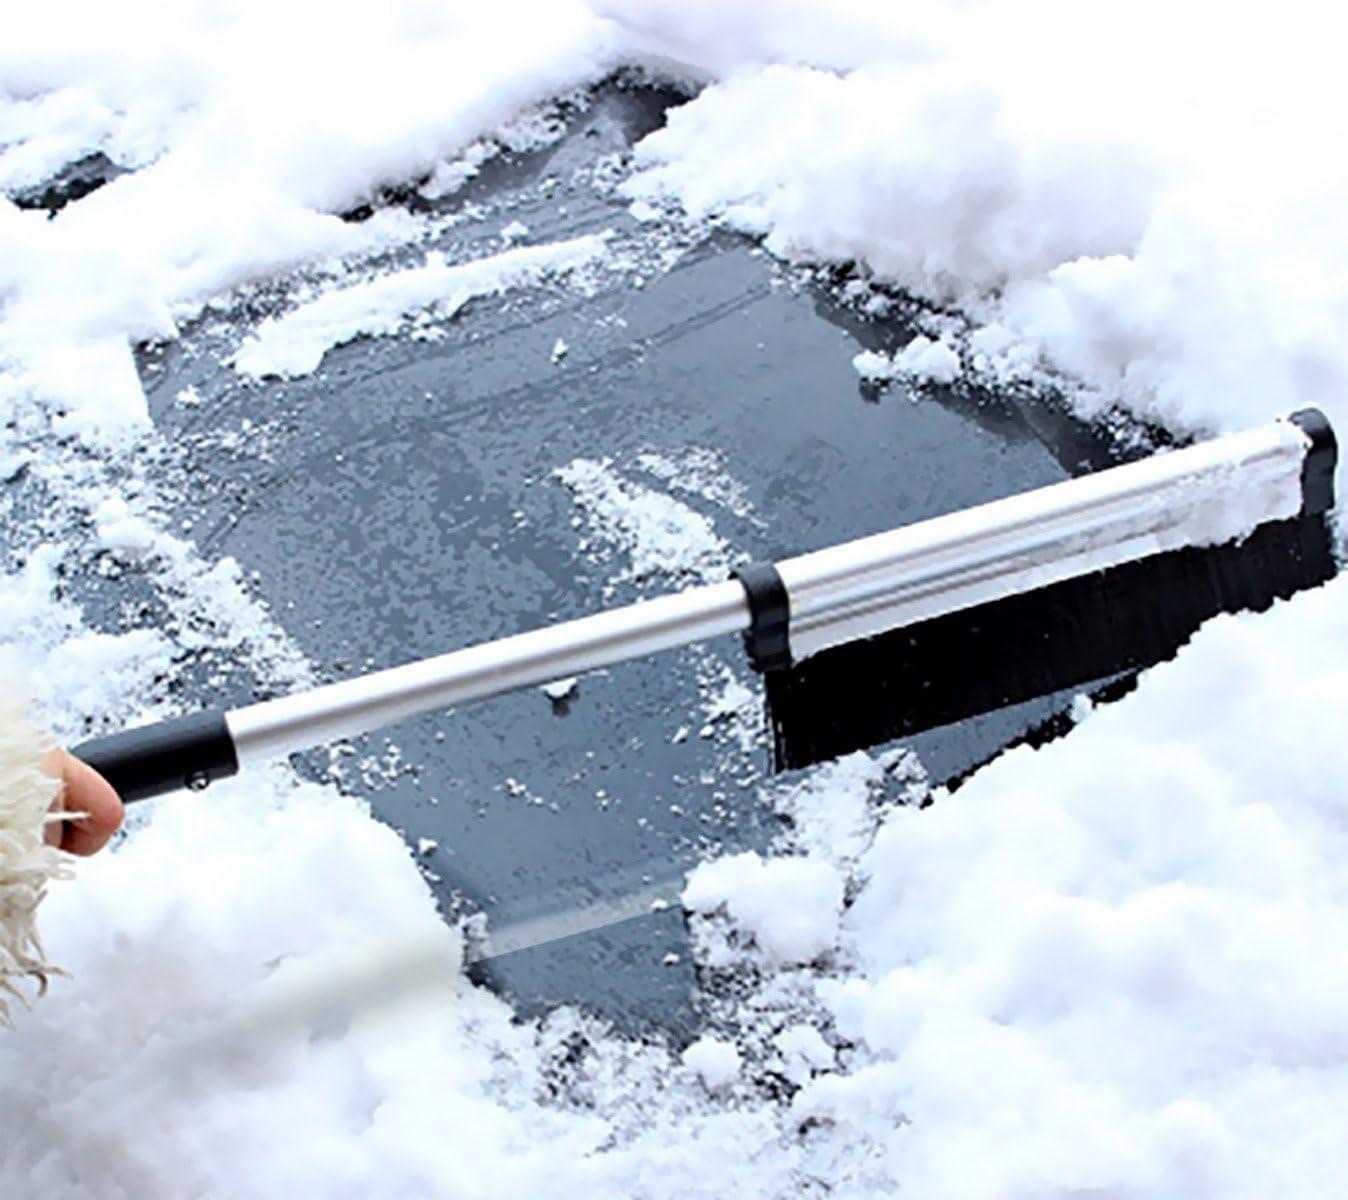 Lightweight Sturdy Aluminium Design 1 pack Fashion vehicle Snow Ice Scraper for Car 2 in 1 Seicosy Extendable Telescoping SnowBrush Shovel Removal Brush Winter